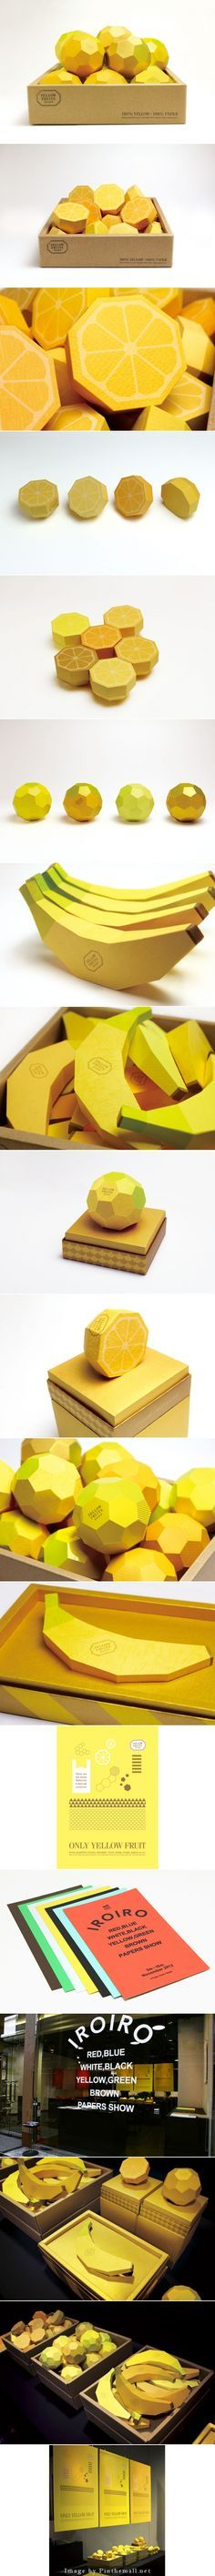 yellow fruit #packaging